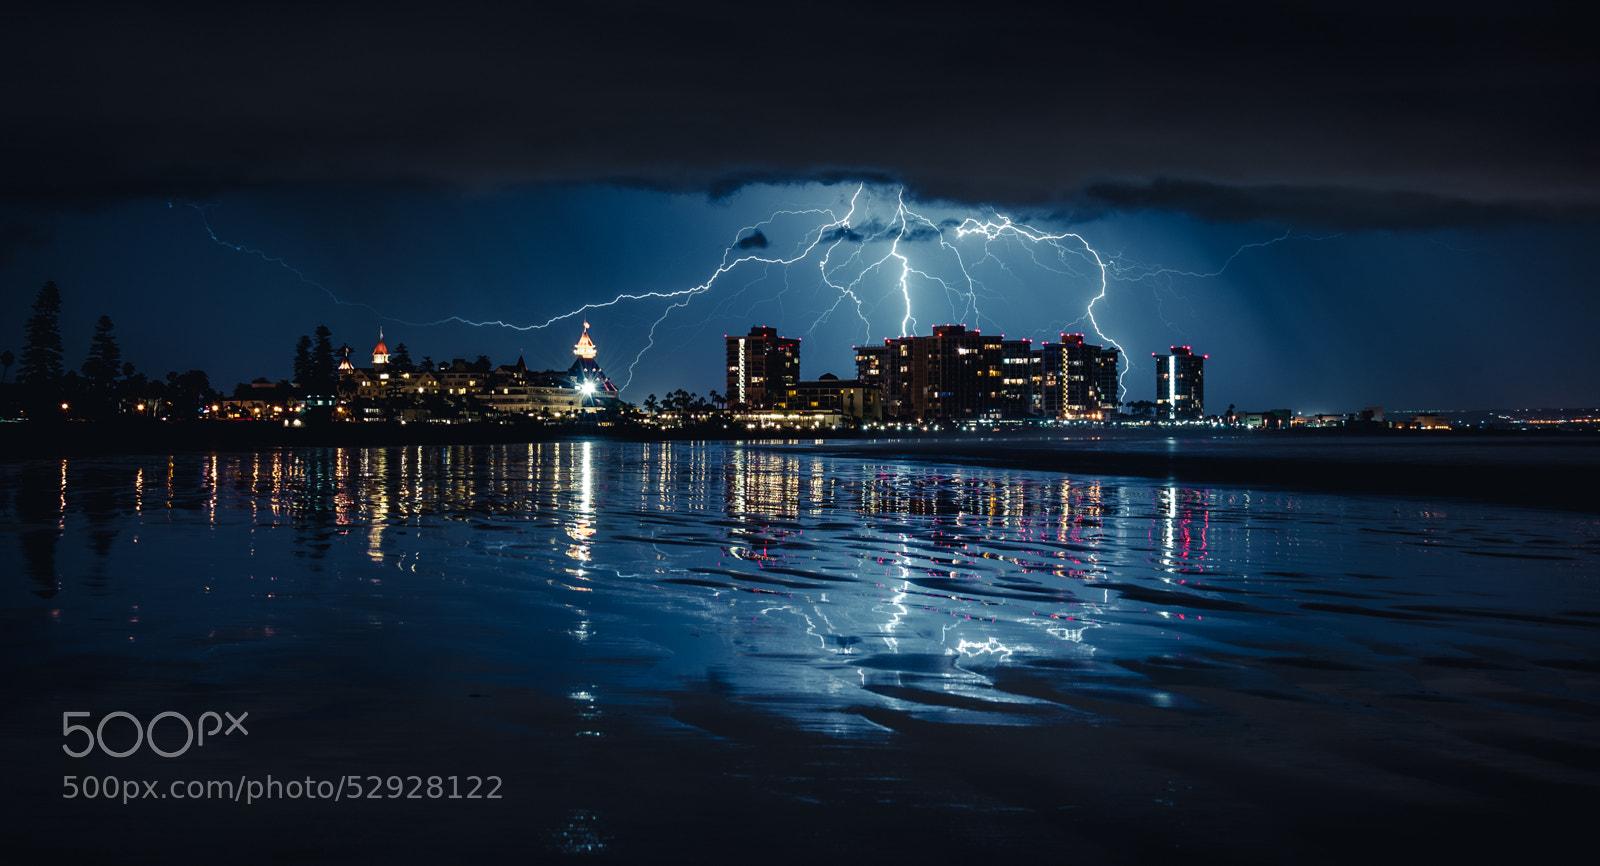 Photograph San Diego Lightning by Dustin Singler on 500px